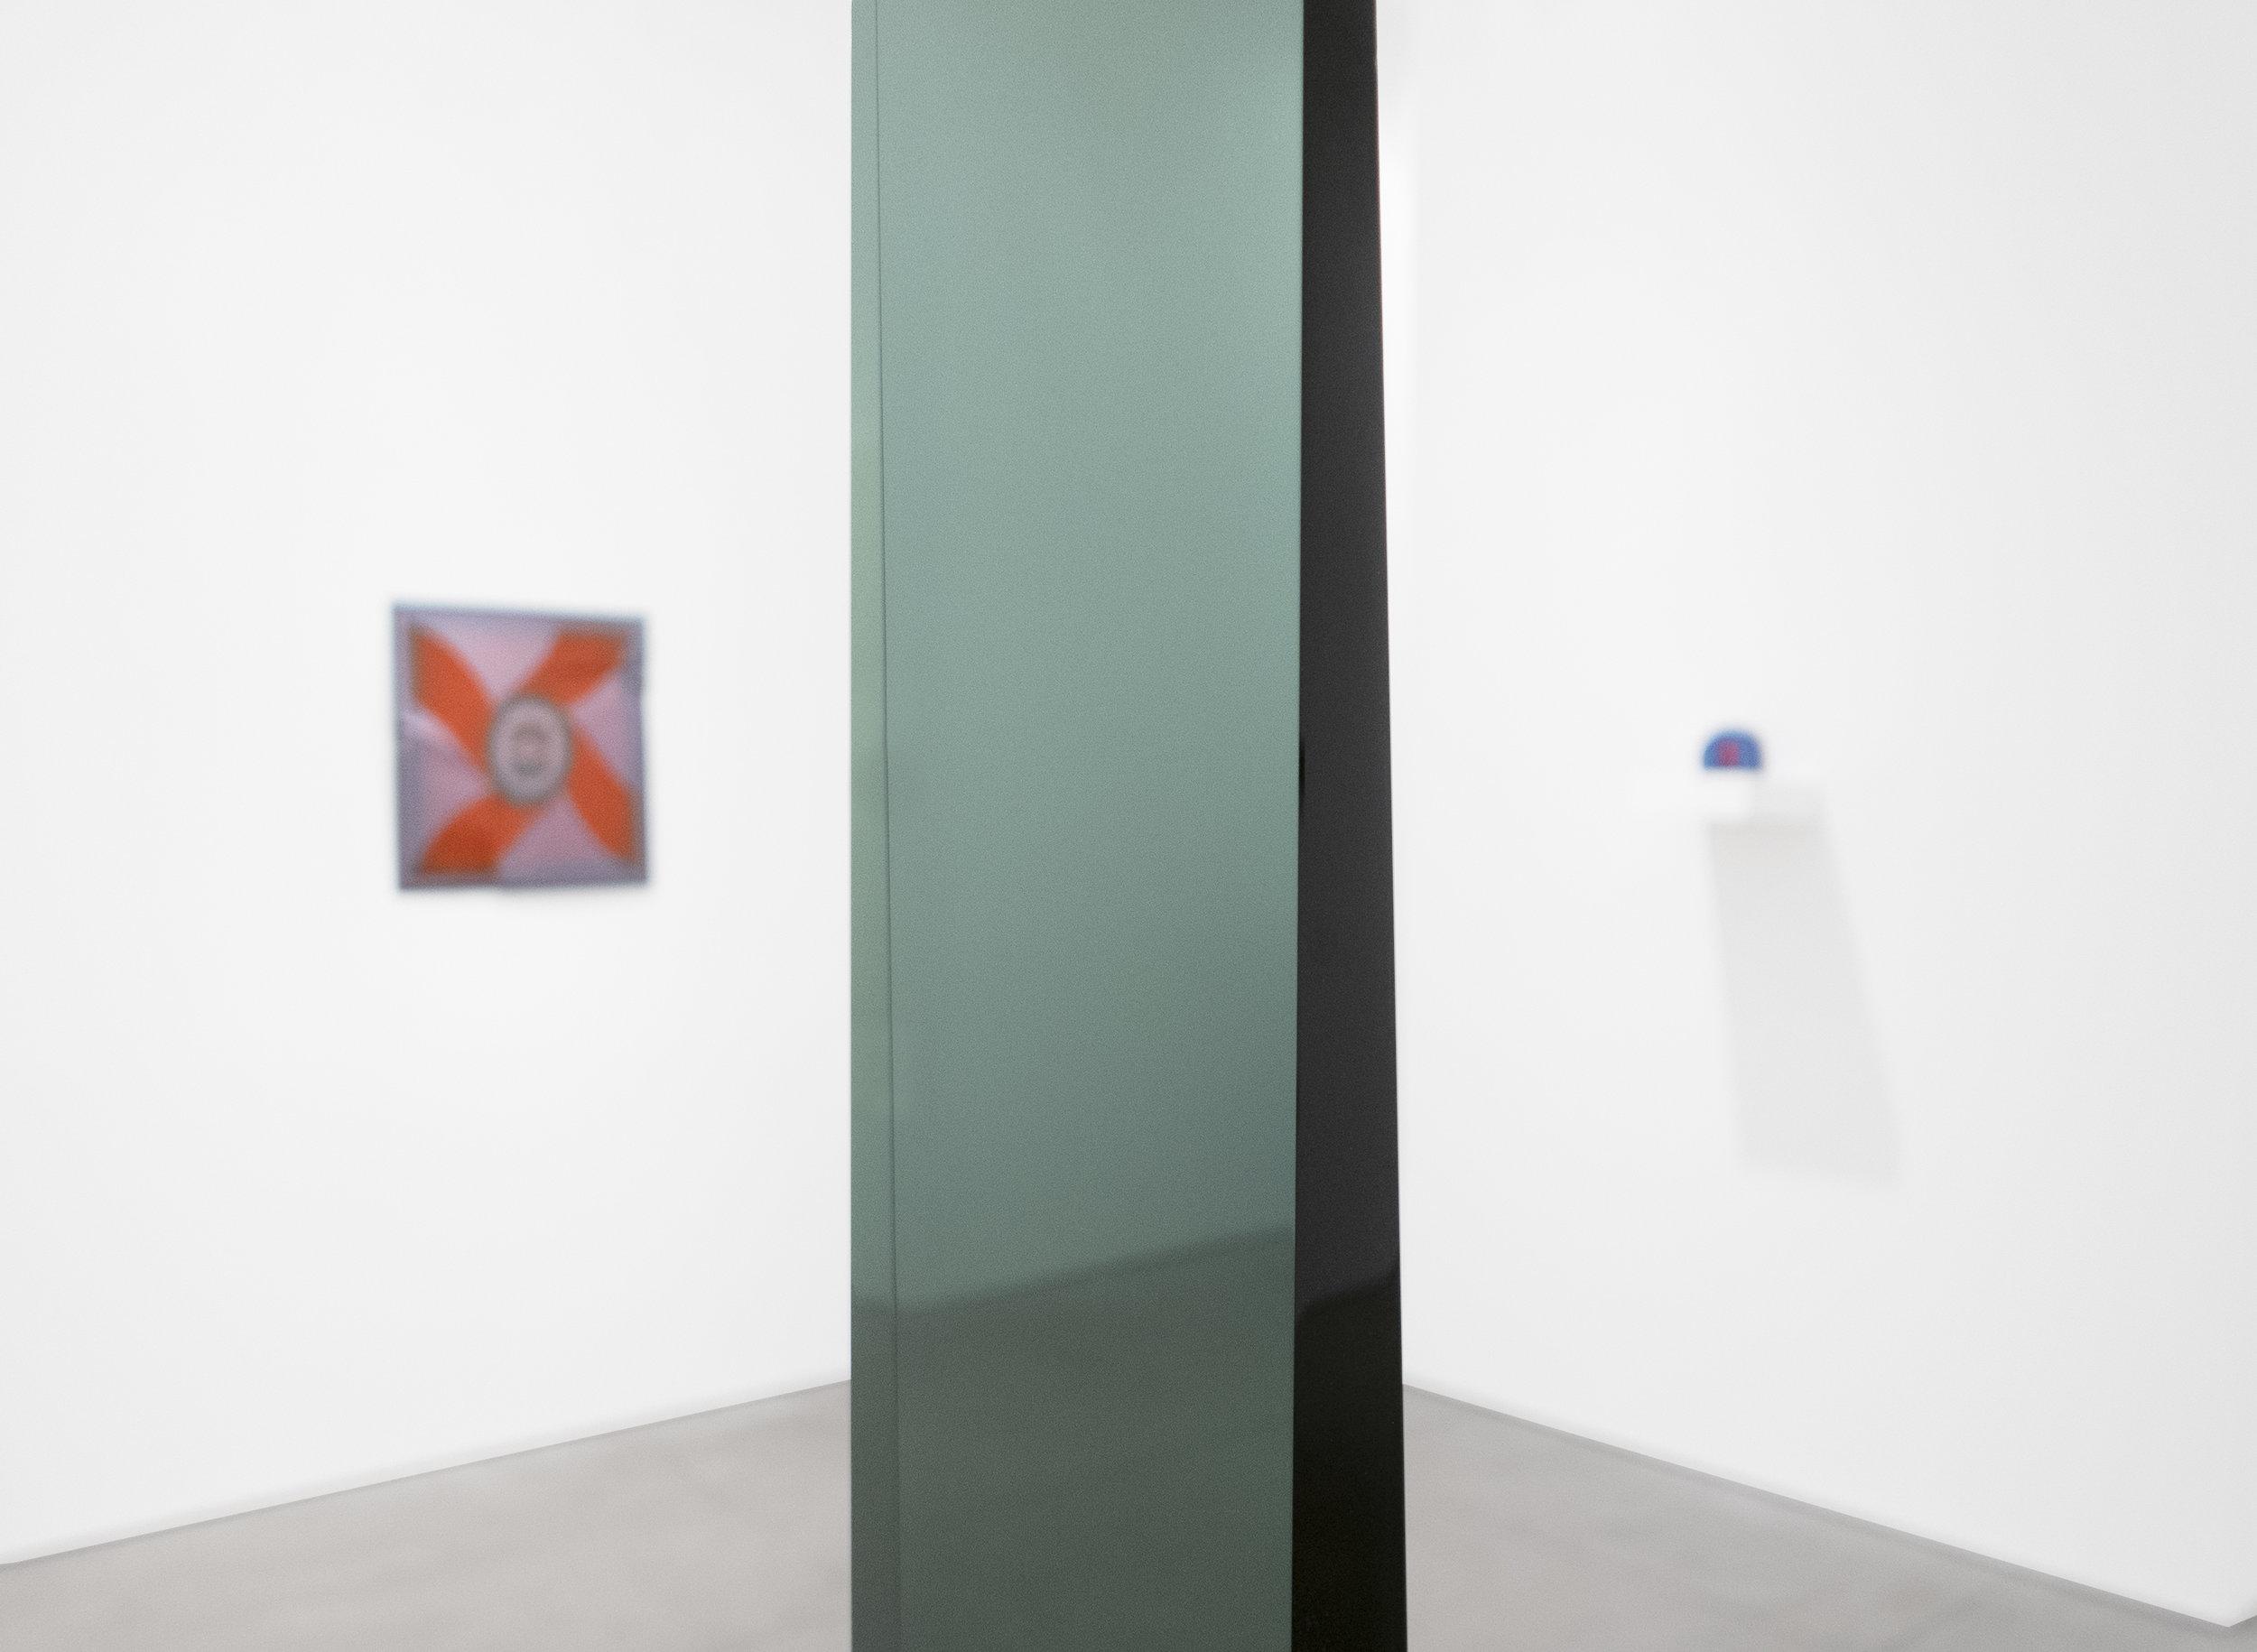 25 Years_Peter Blake Gallery_2019_Installation View_40.jpg